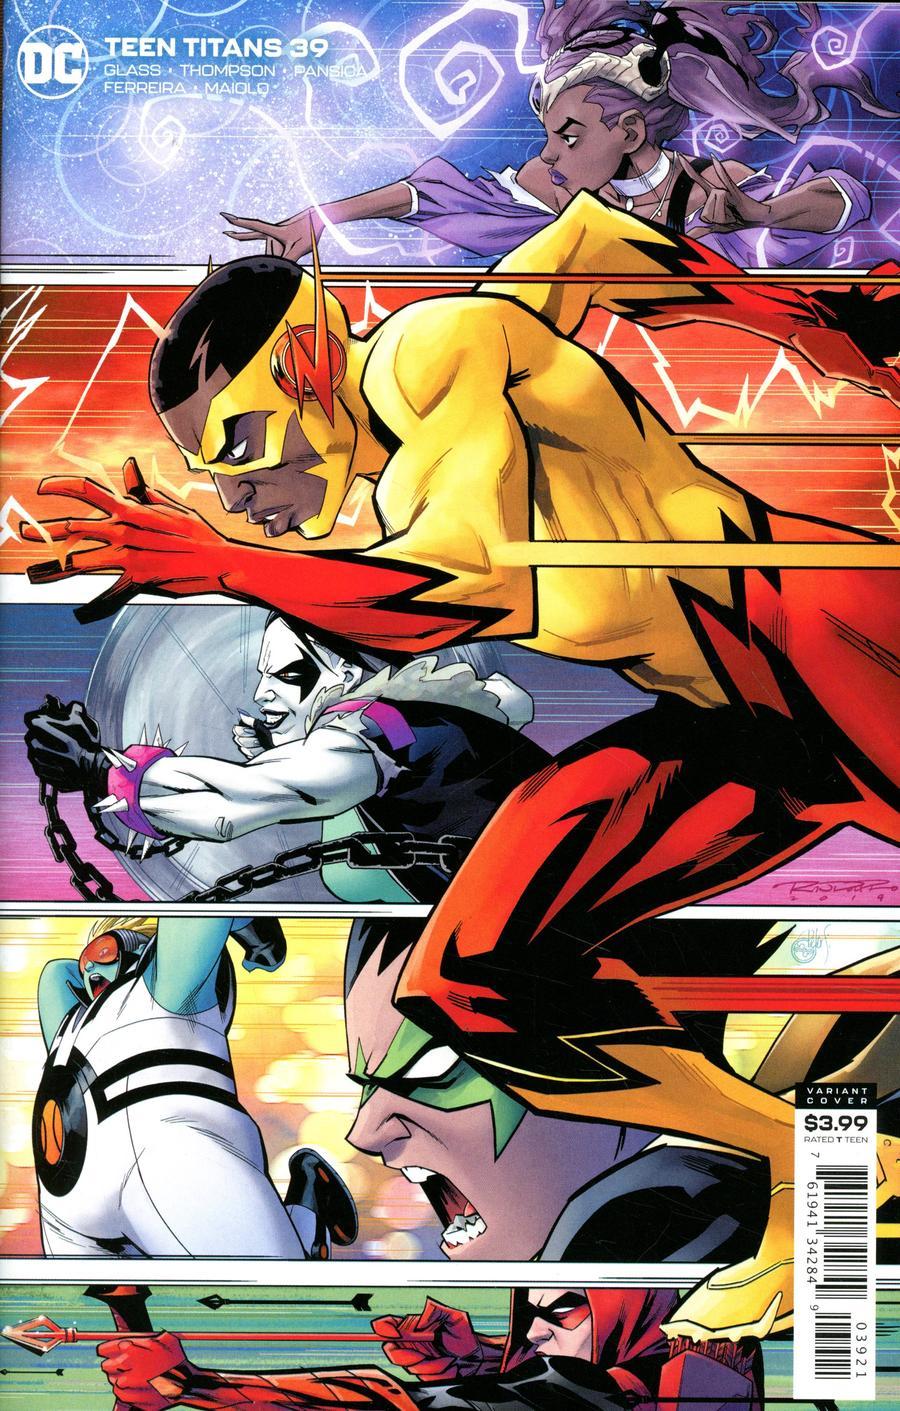 Teen Titans Vol 6 #39 Cover B Variant Khary Randolph Cover